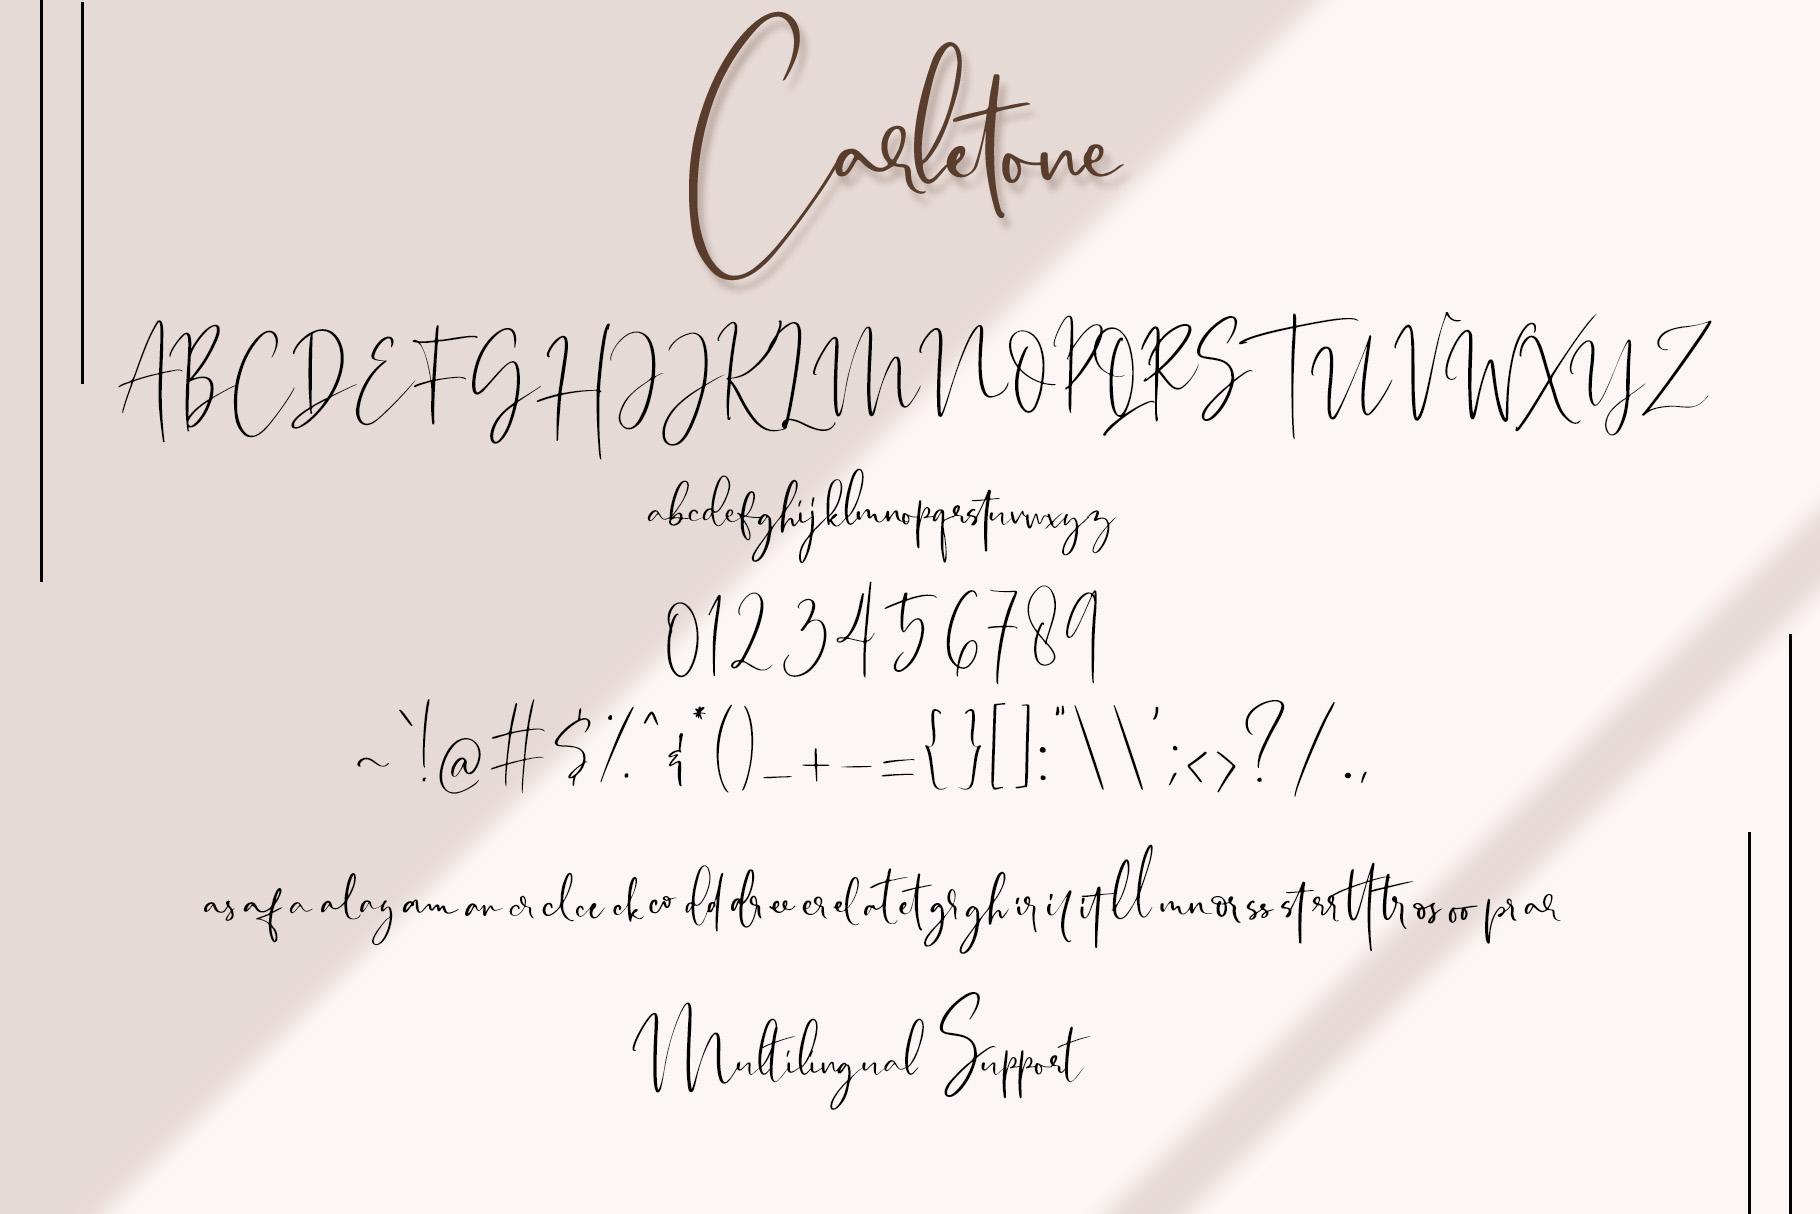 Carletone - Classy Signature example image 7